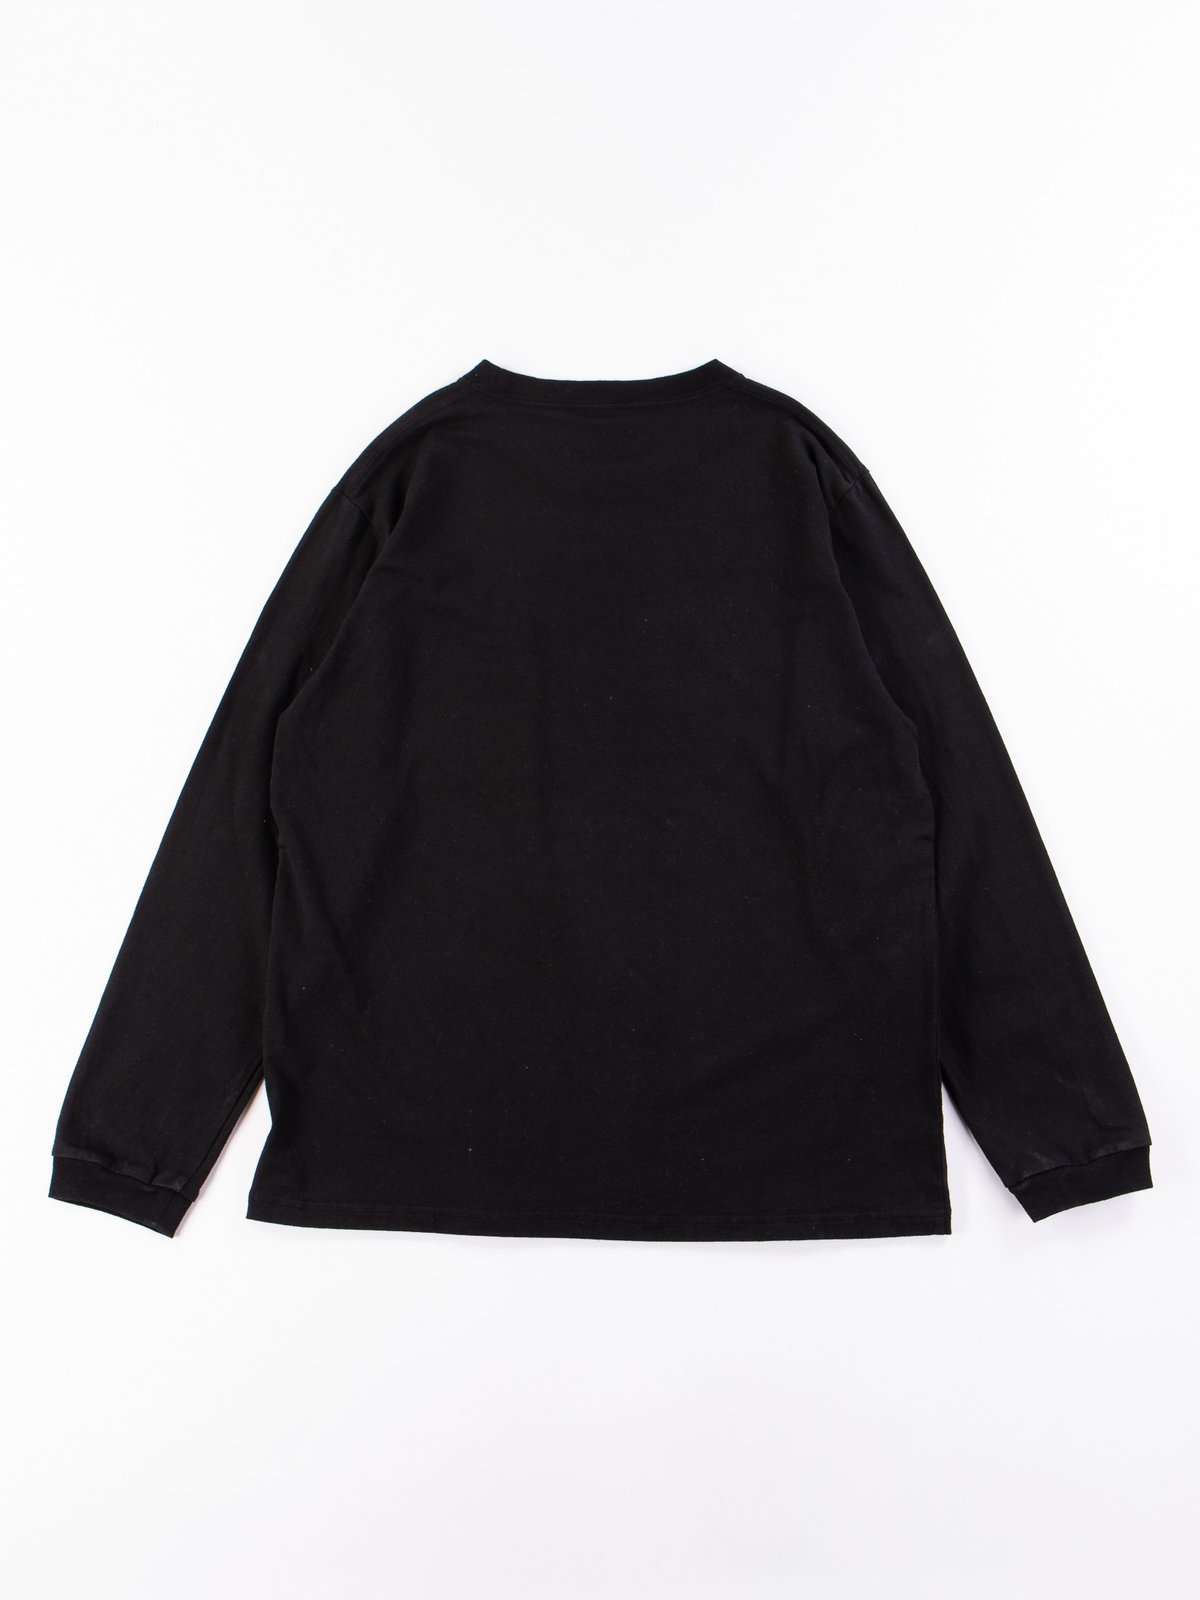 Black Long Sleeve Pocket T–Shirt - Image 6